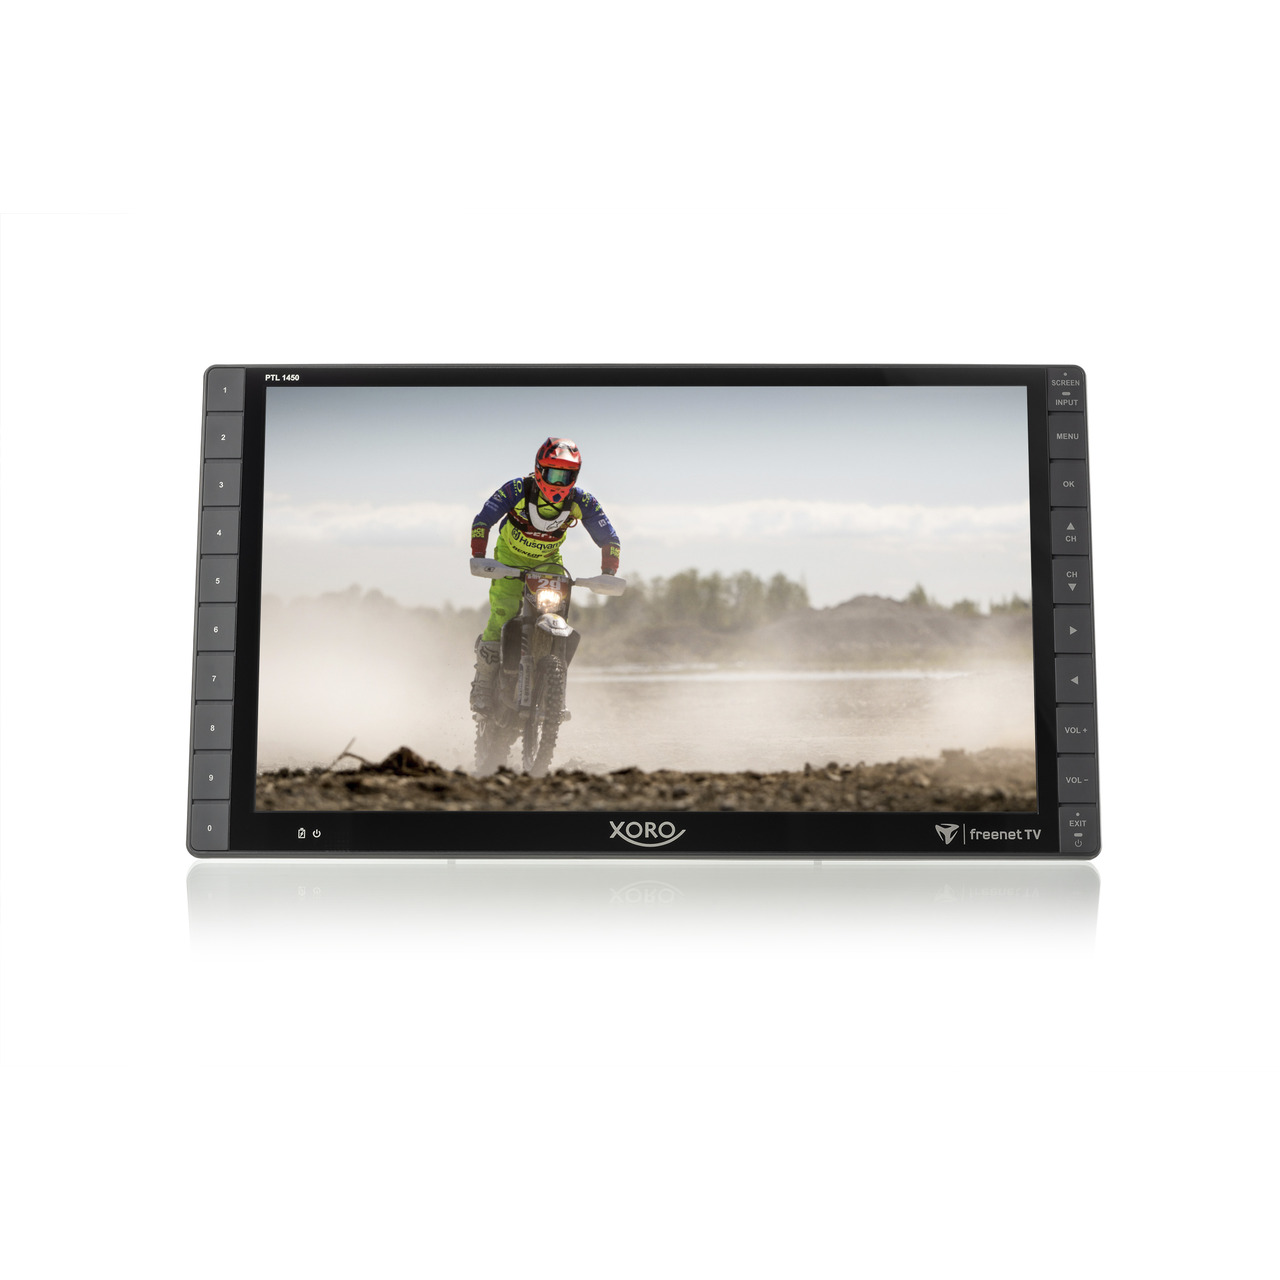 Xoro Portabler Fernseher PTL1450- DVB-T2-HD (H-265)- 35-5-cm-Full-HD-Display (14)- inkl- freenet TV